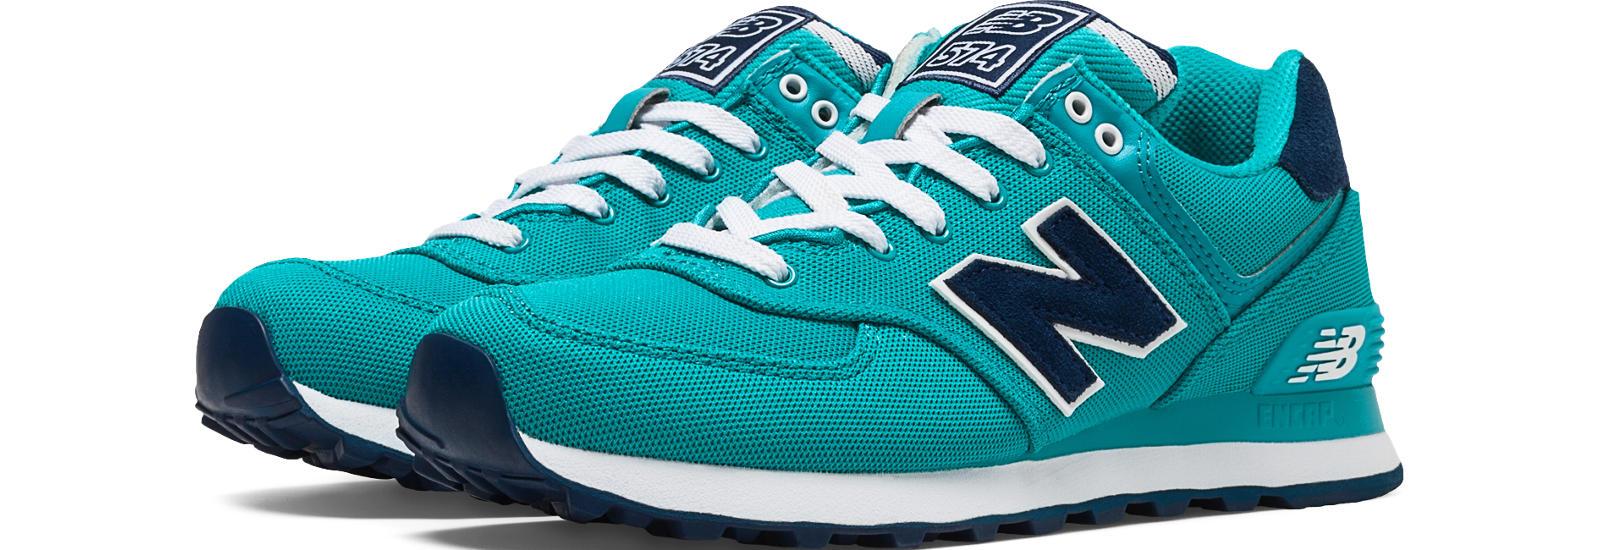 New Balance 574 Women Teal/Navy Shoes